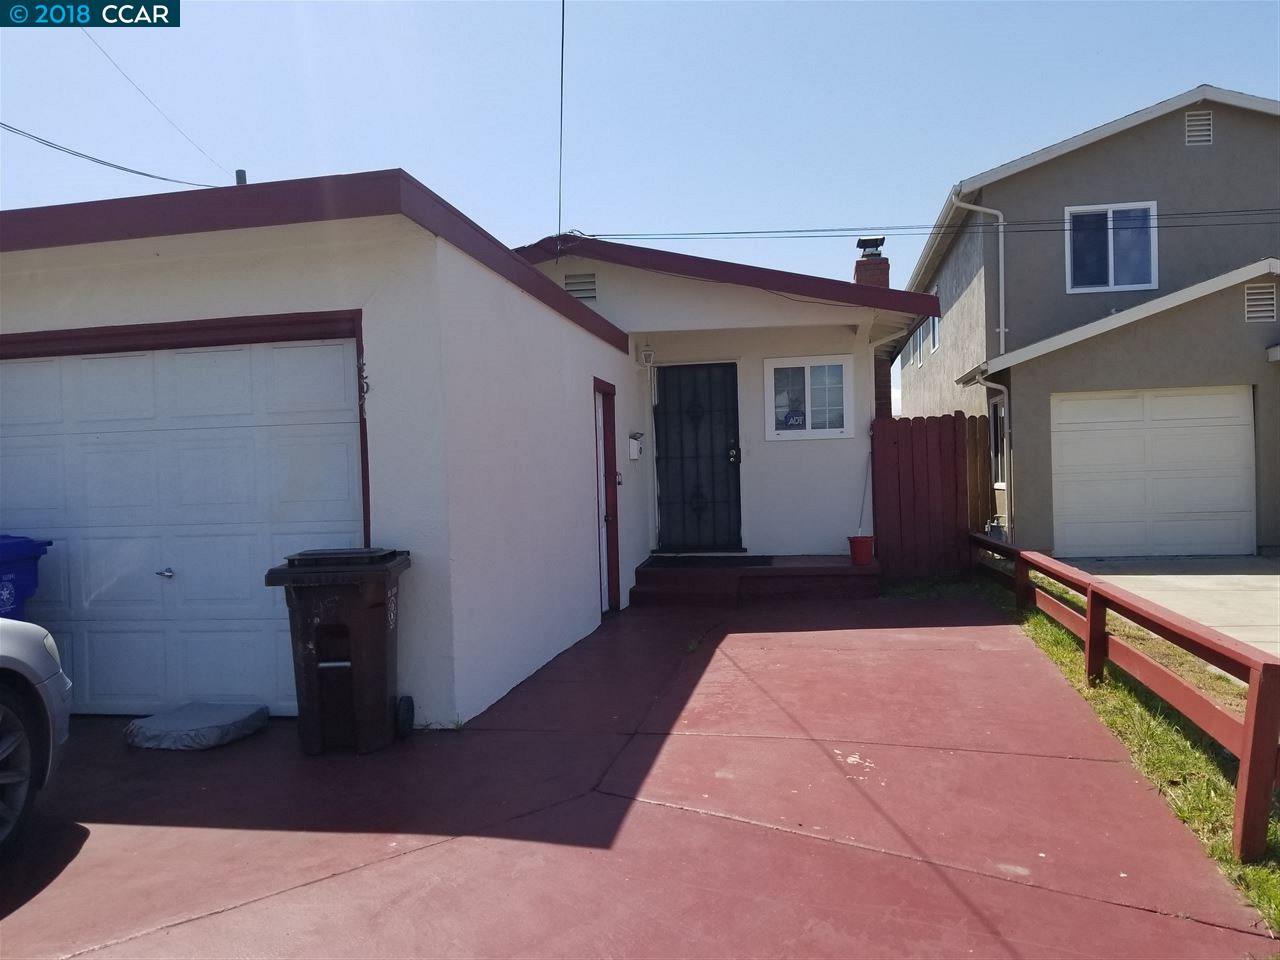 457 SPRING ST, RICHMOND, CA 94804